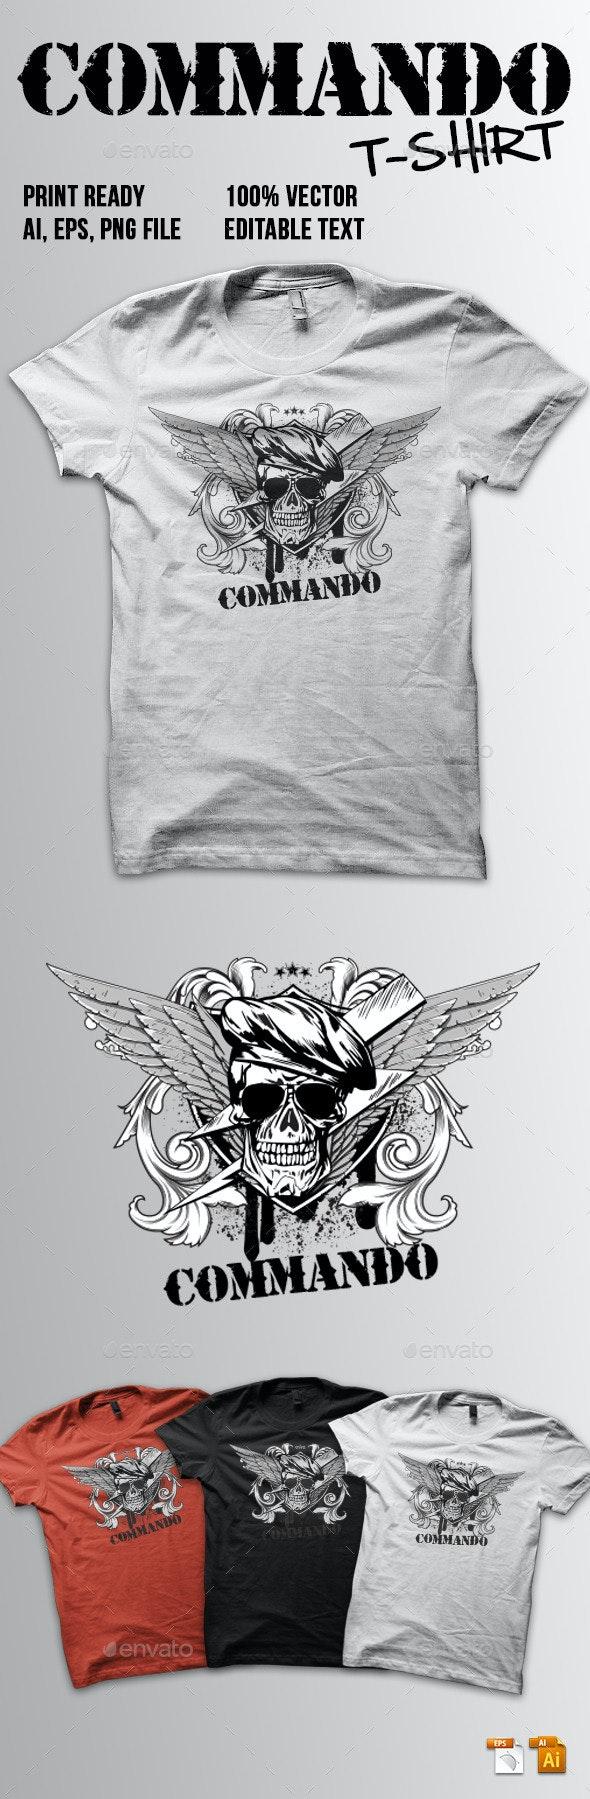 Commando T-Shirt - Grunge Designs